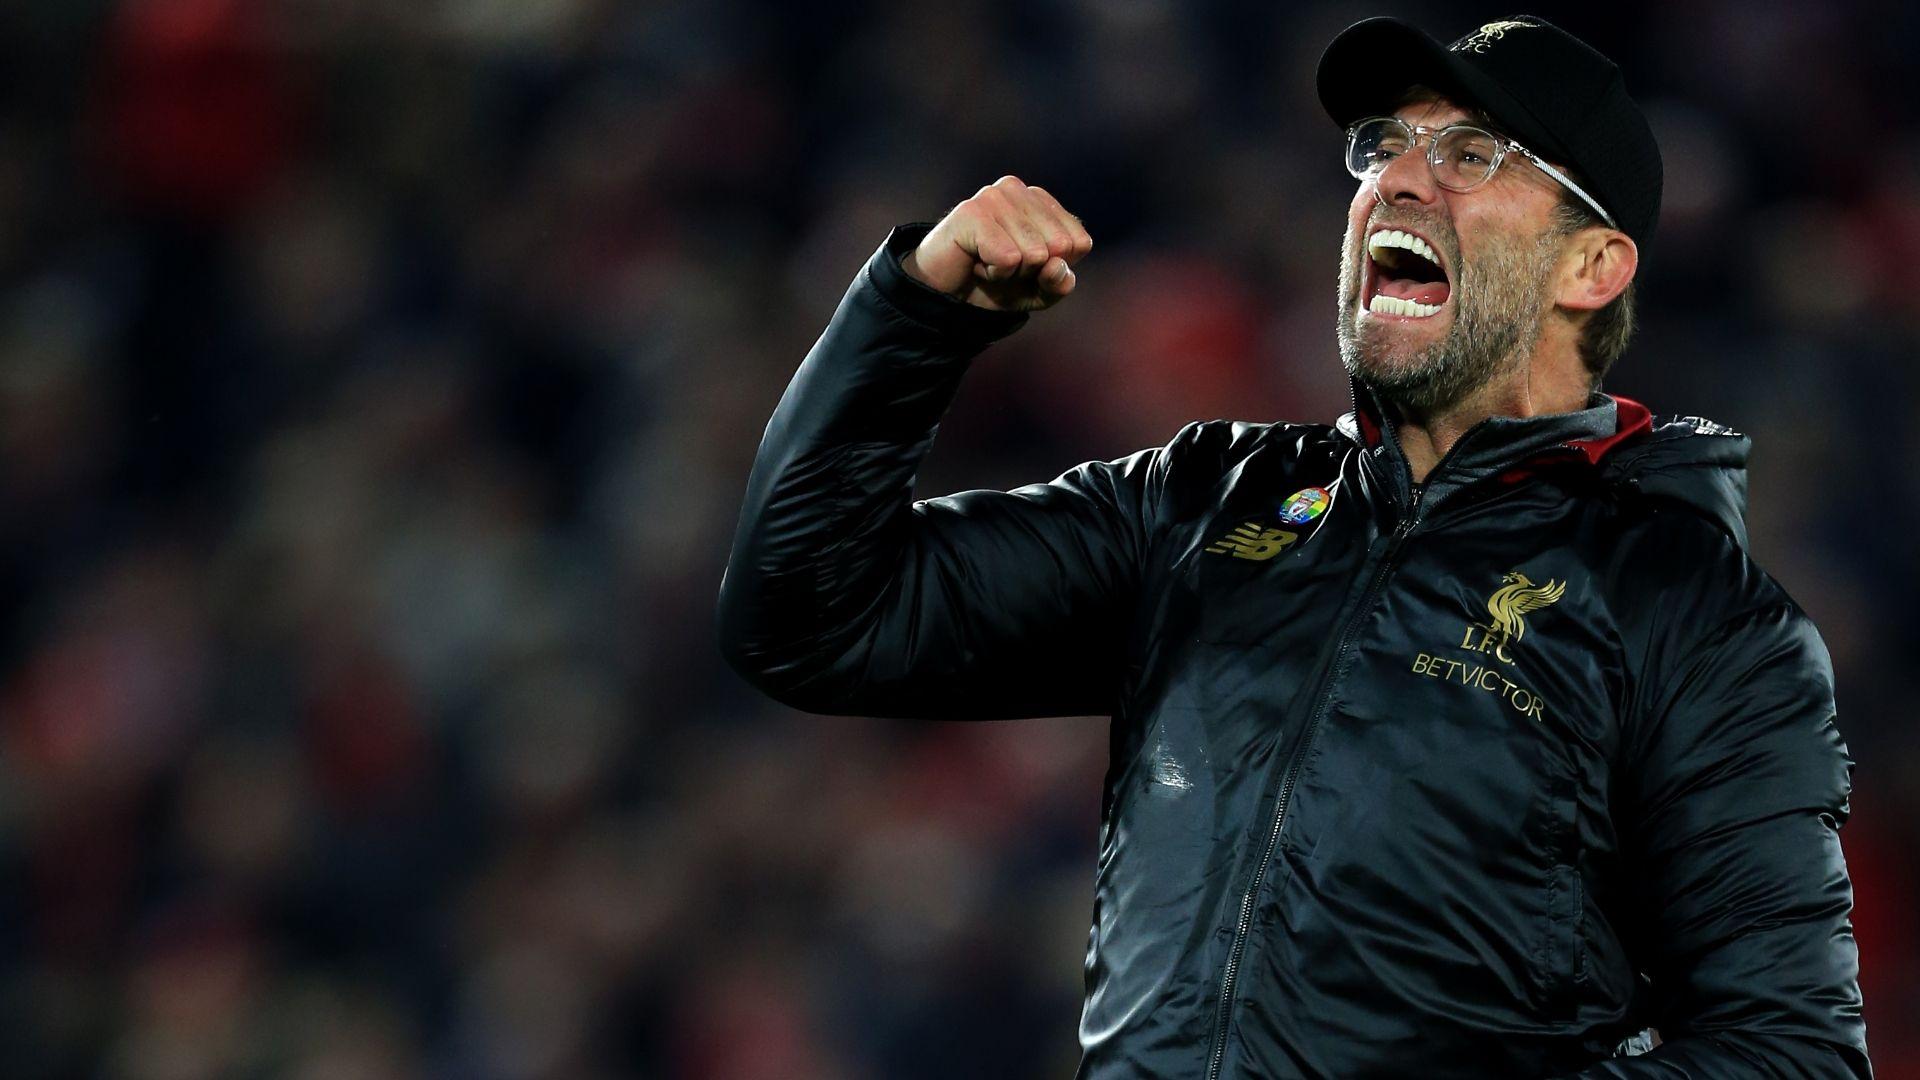 Wolves Vs Man United Wallpaper: Wolves Vs Liverpool Preview